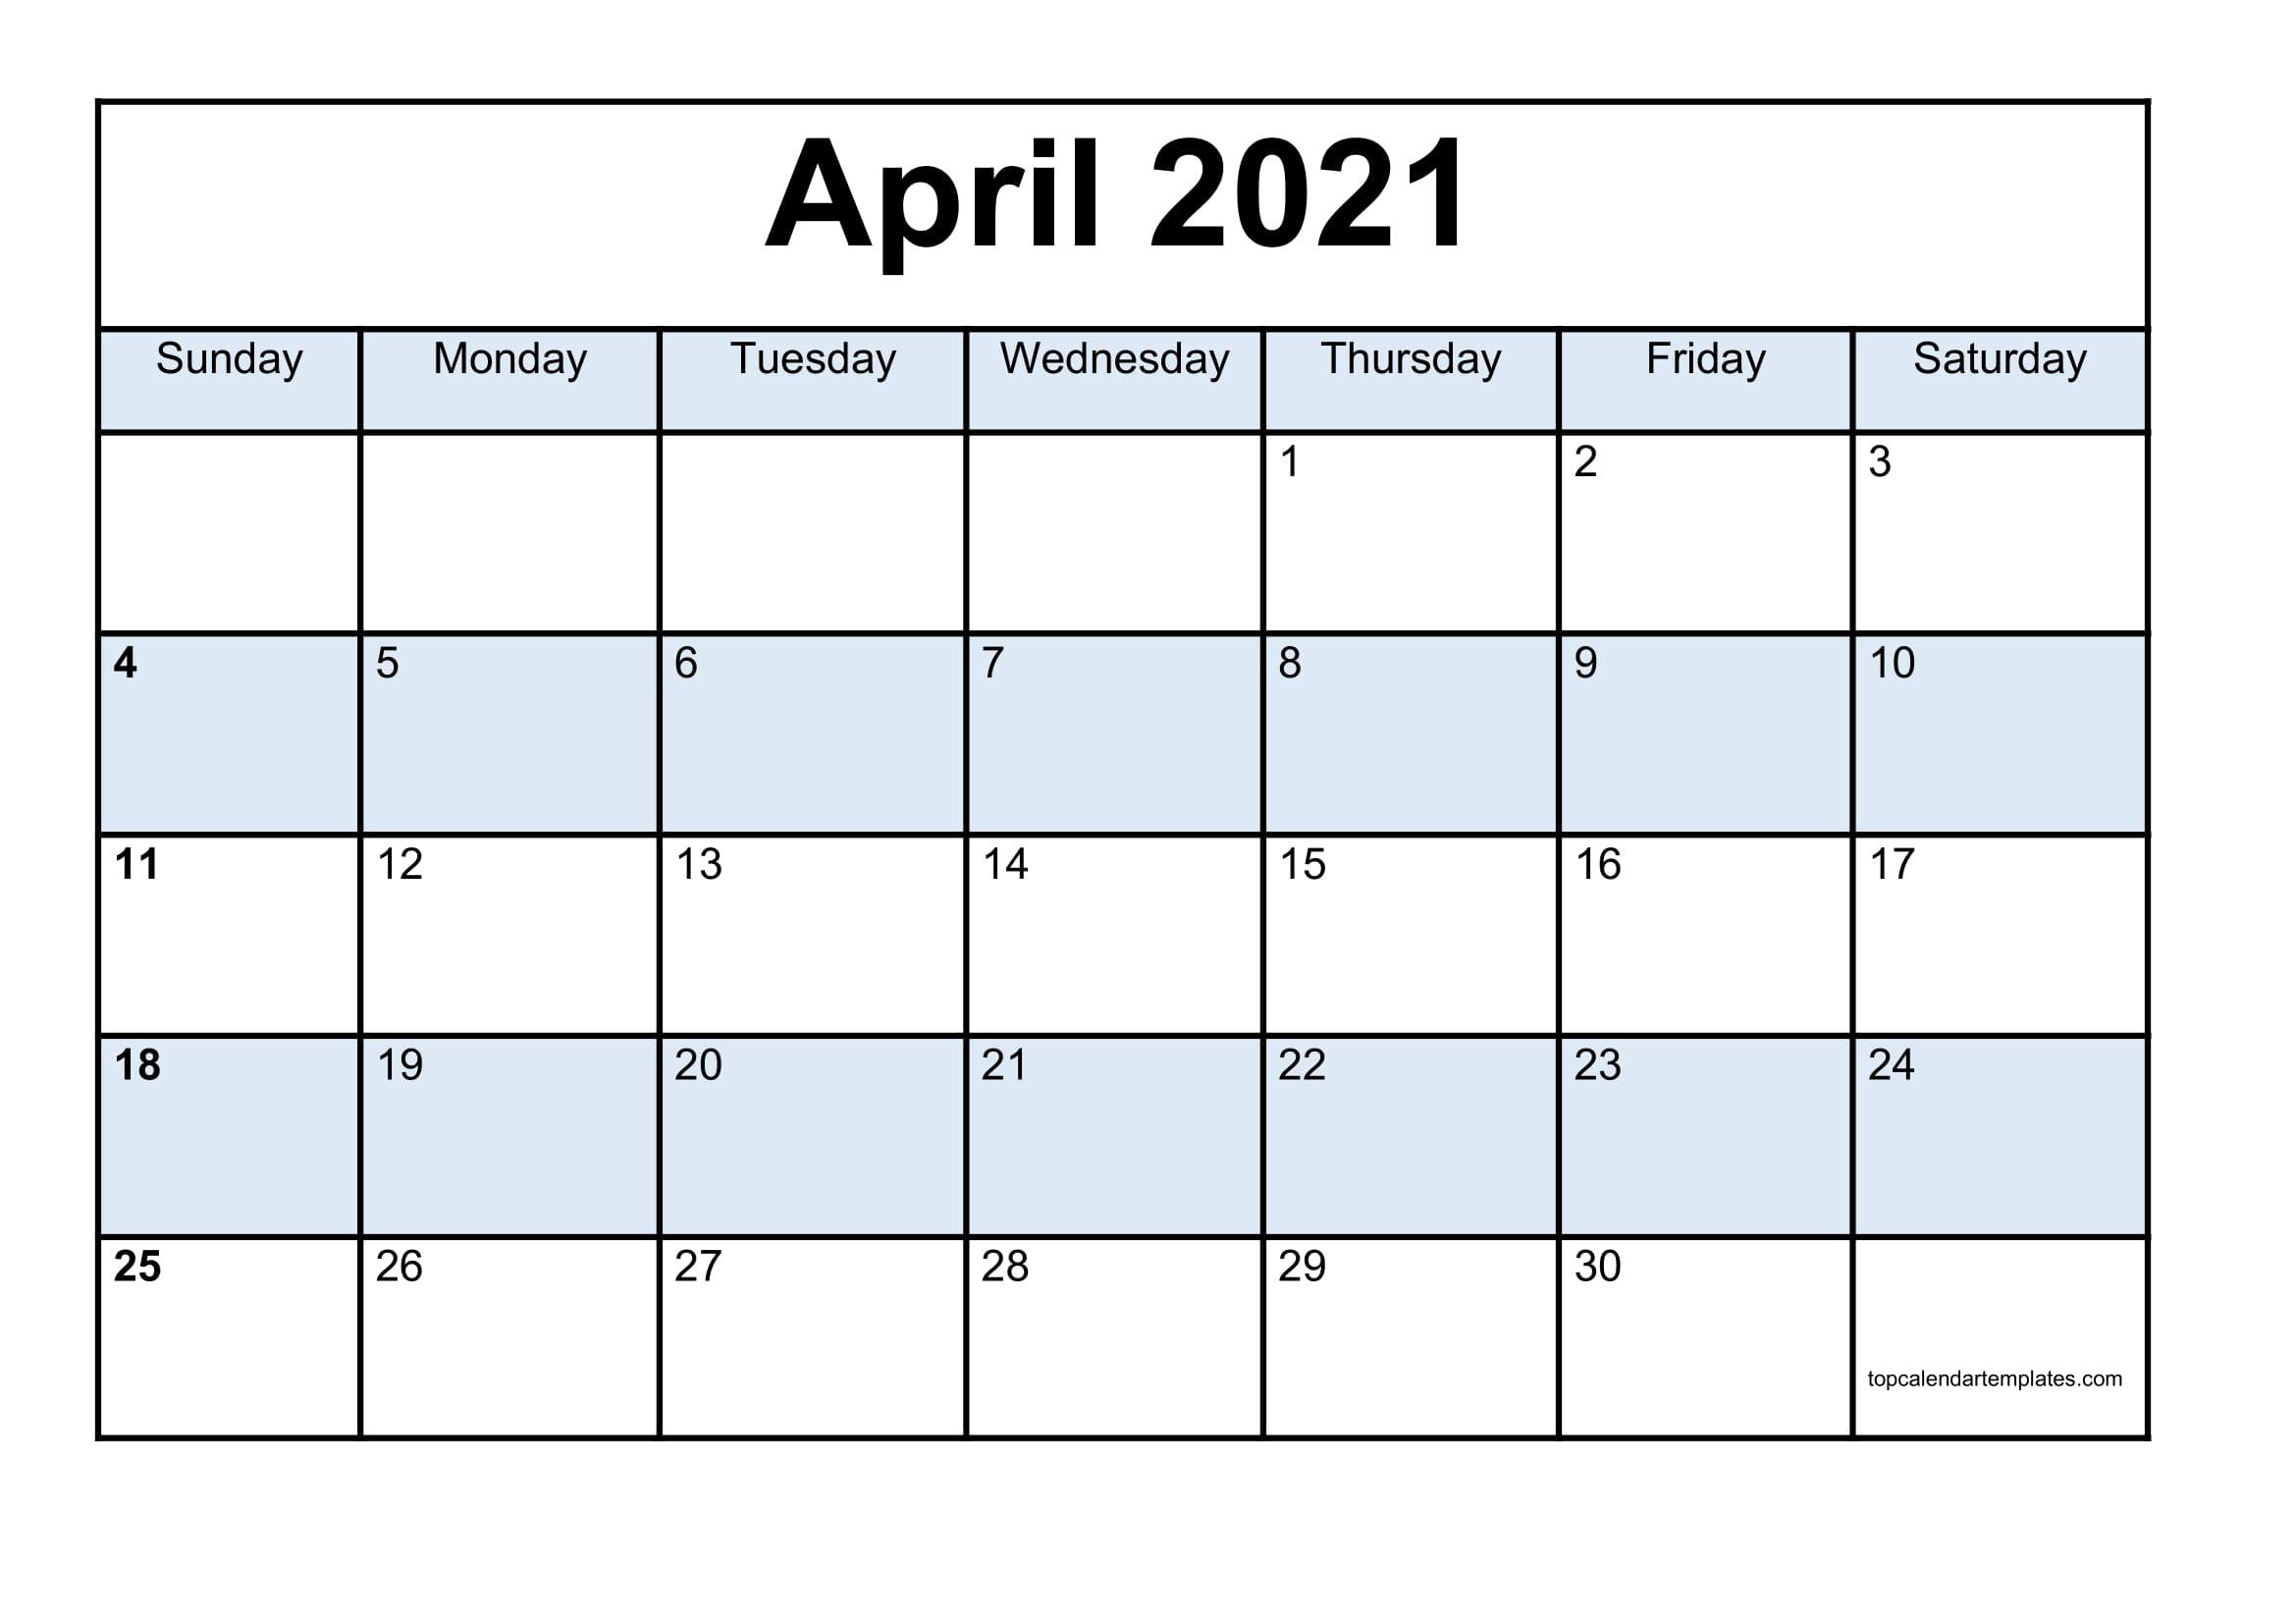 Blank April 2021 Calendar Template - Monthly Planner